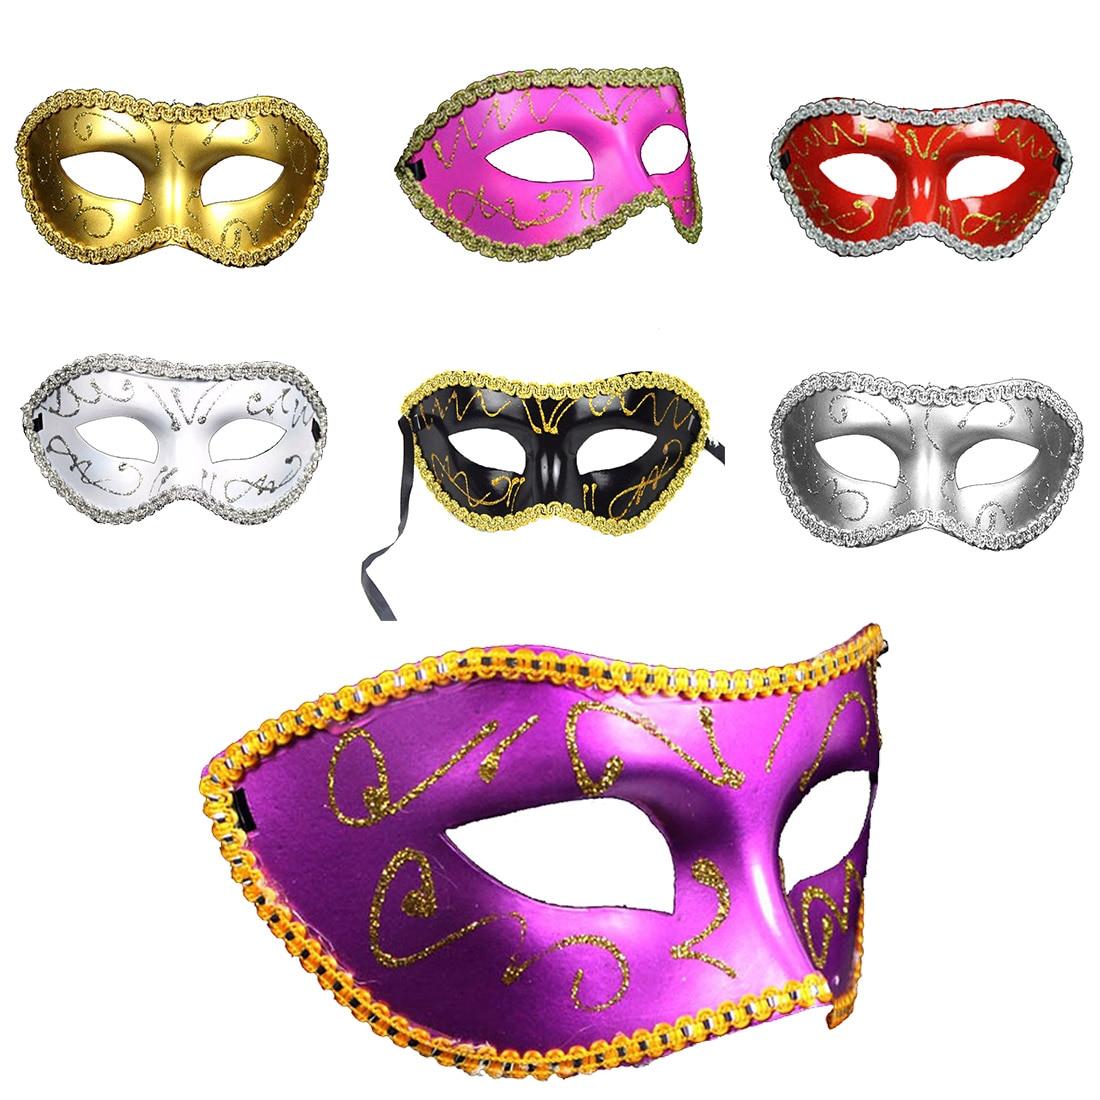 Sexy Men Women Costume Prom Mask Venetian Mardi Gras Party Dance Masquerade Ball Halloween Mask Fancy Dress Costume